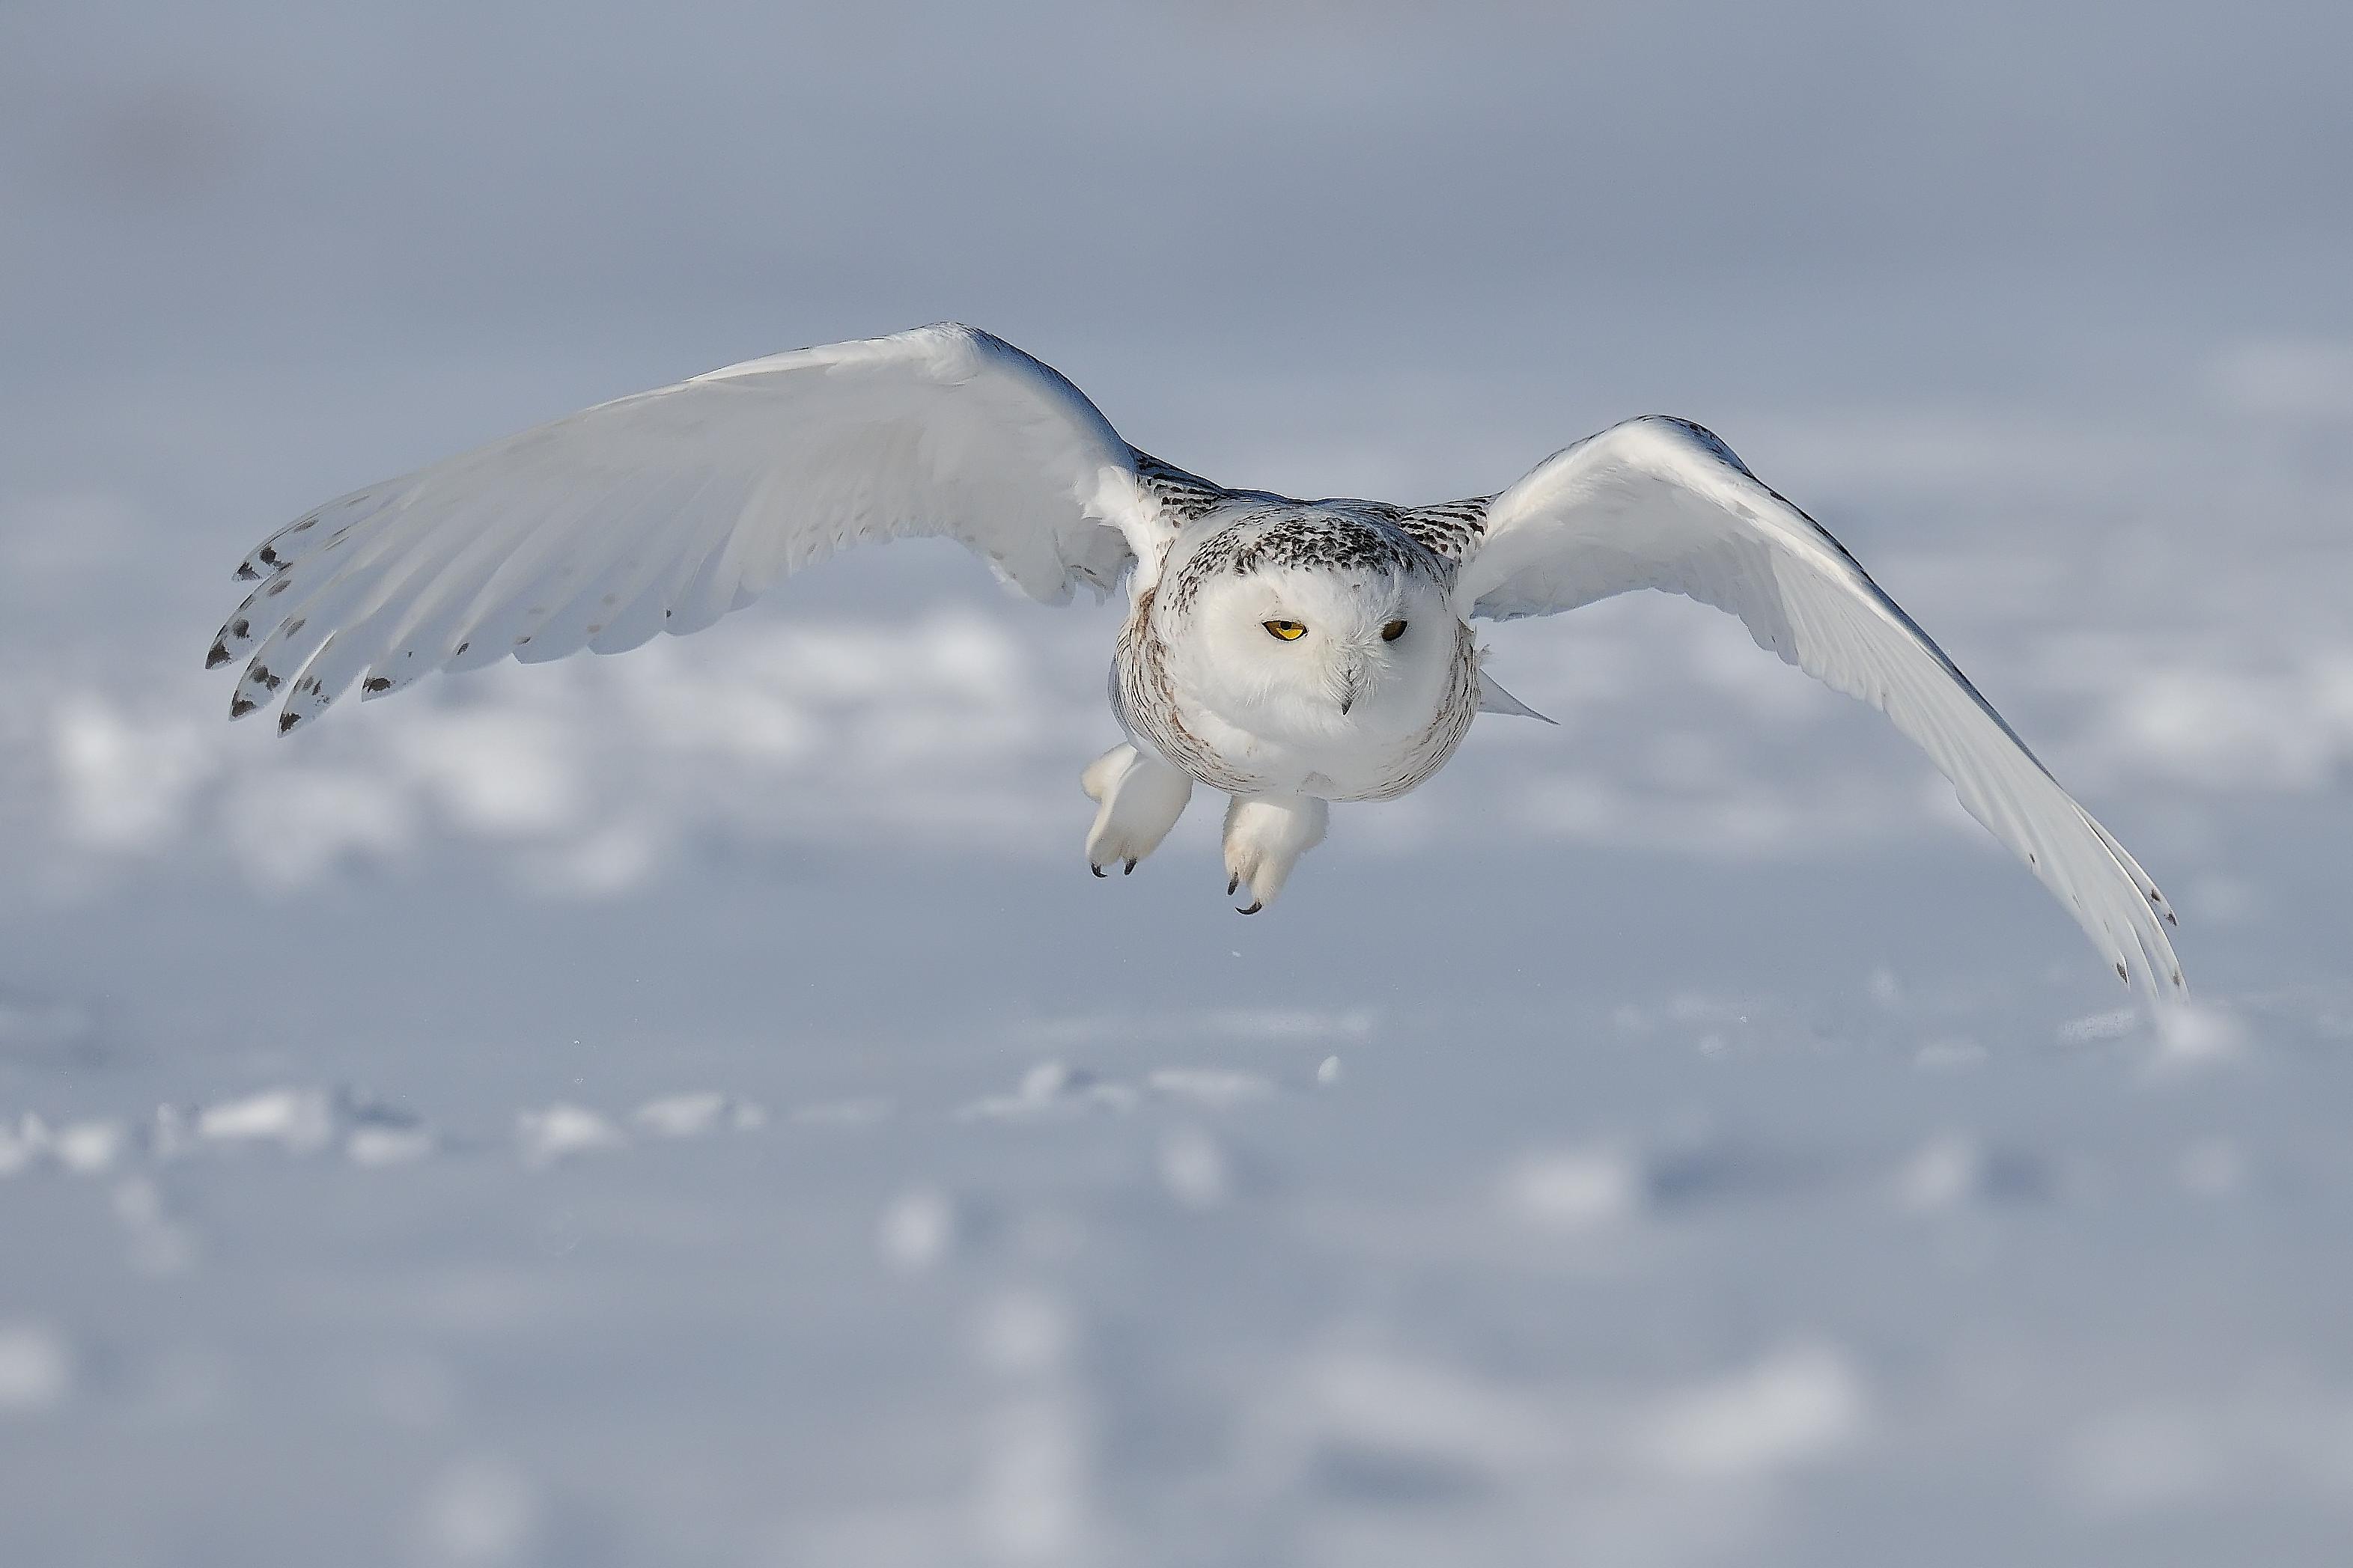 Snowy Owl – Wallpaper – 3143 X 2095 #170713 HD Wallpaper Res .